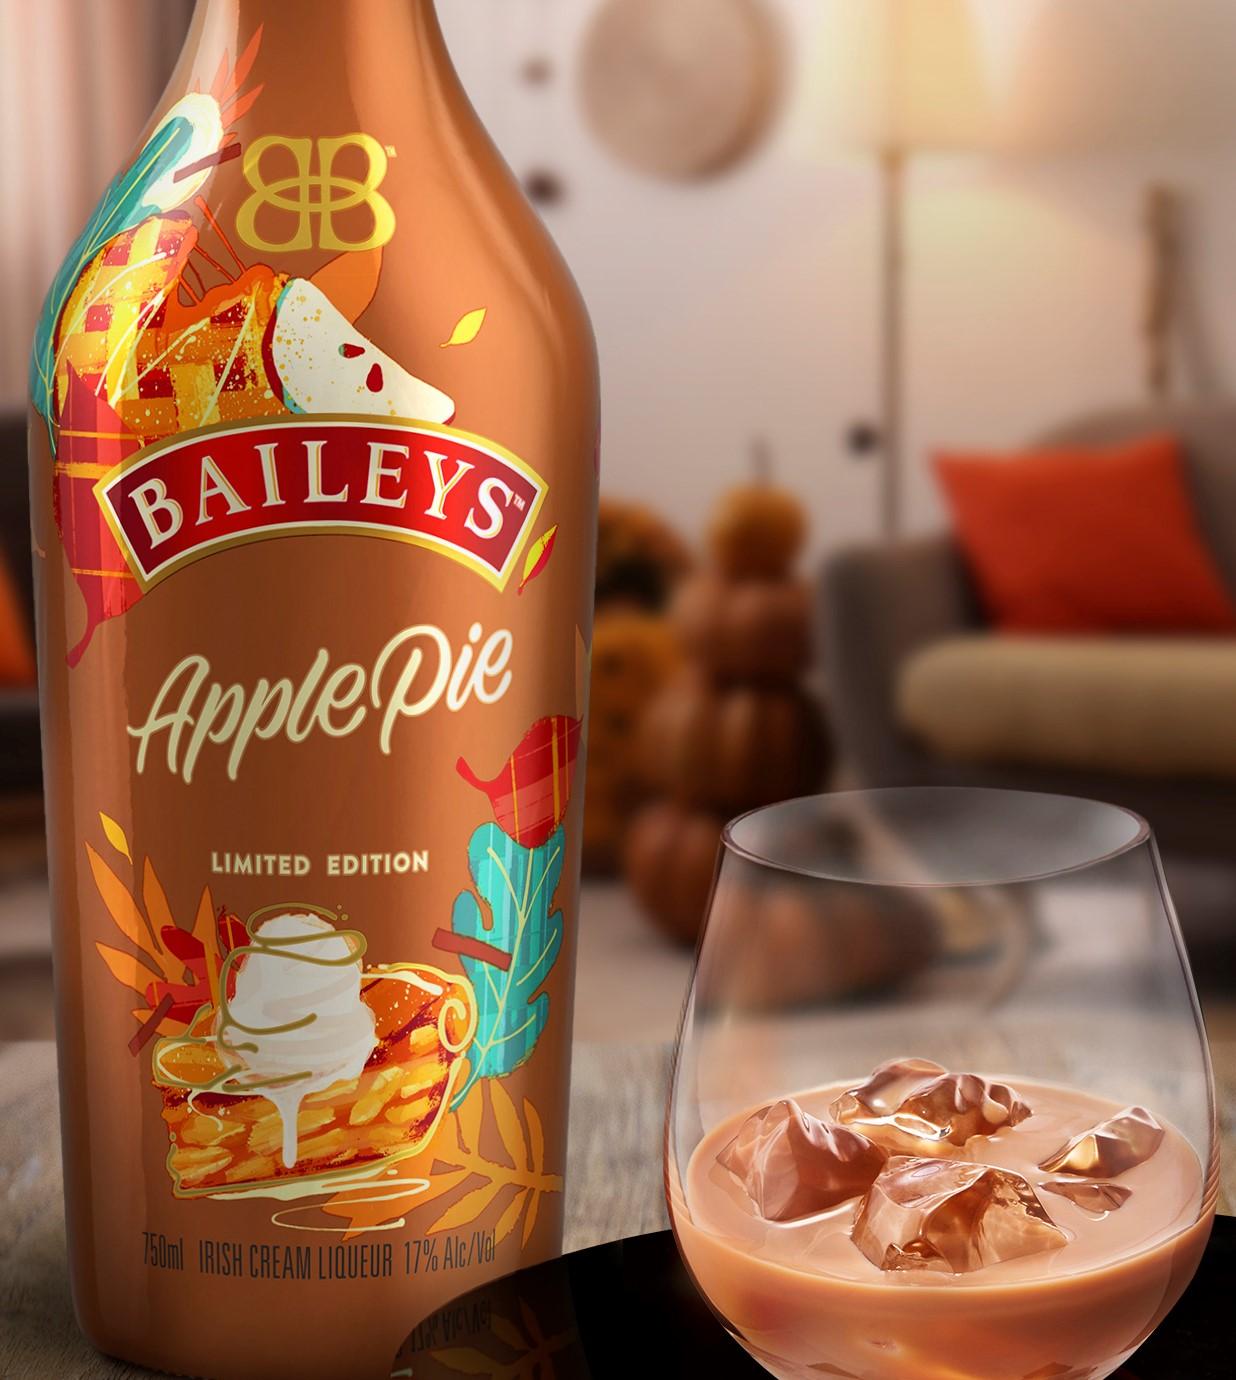 Baileys Apple Pie Recipes Over Ice